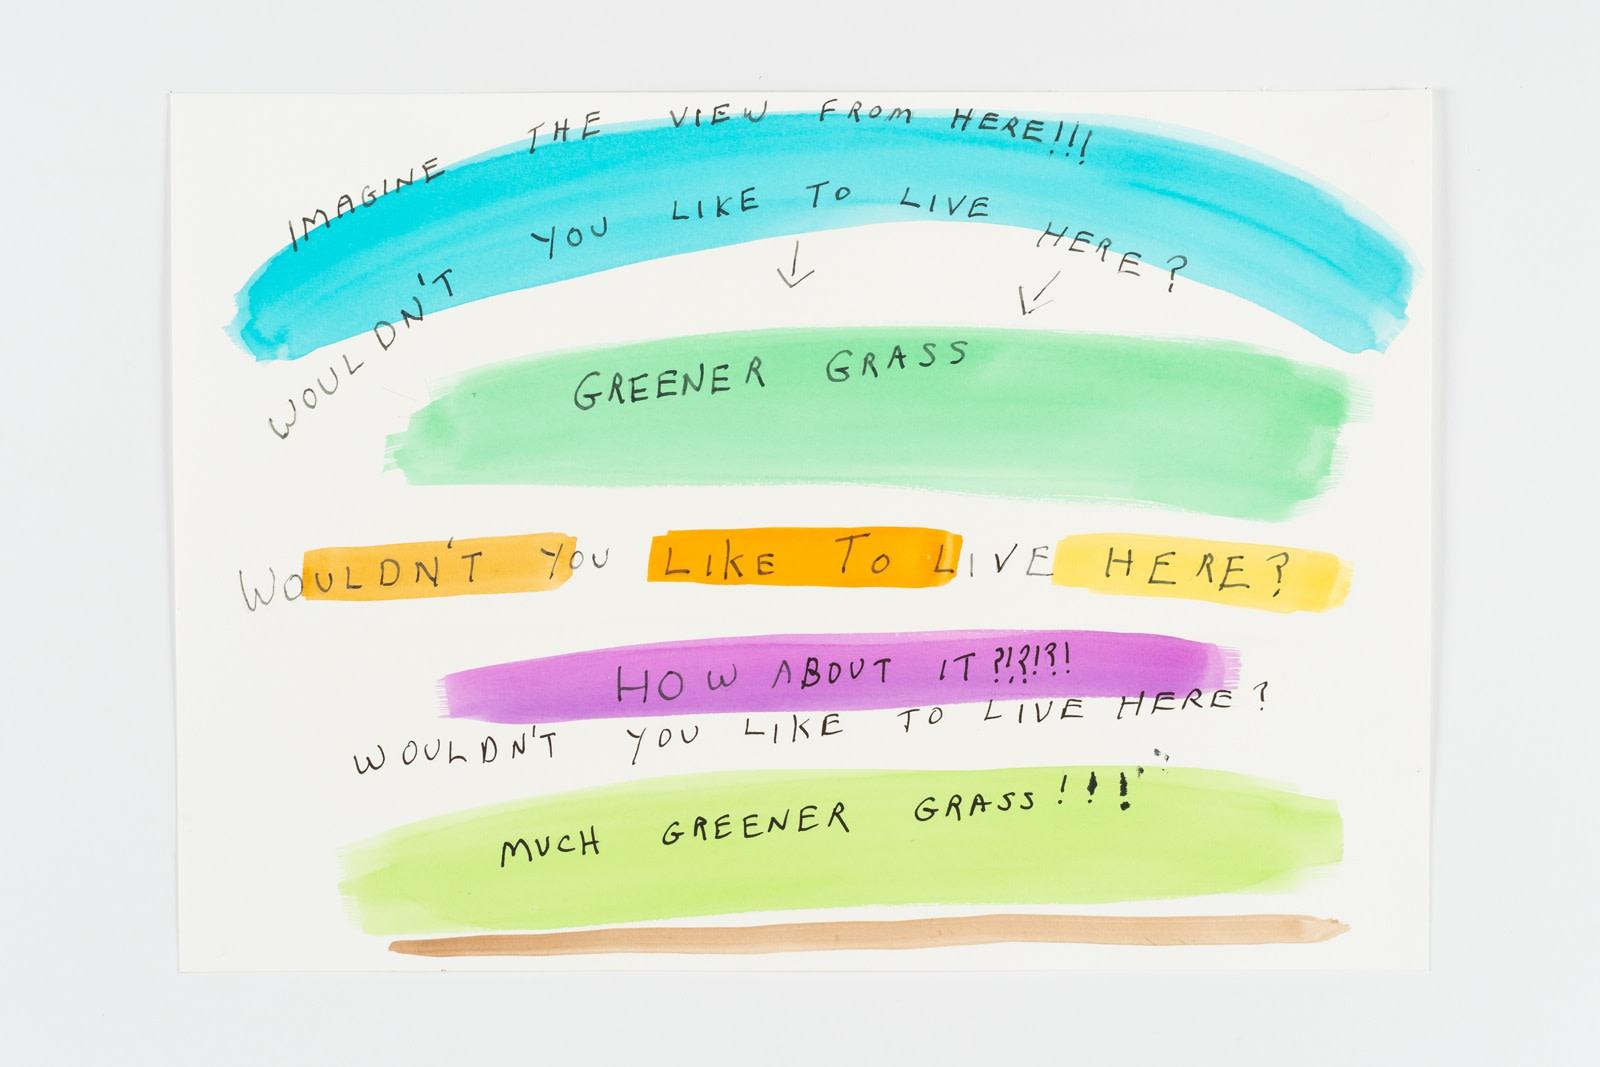 Michael Smith, Greener Grass, 2015